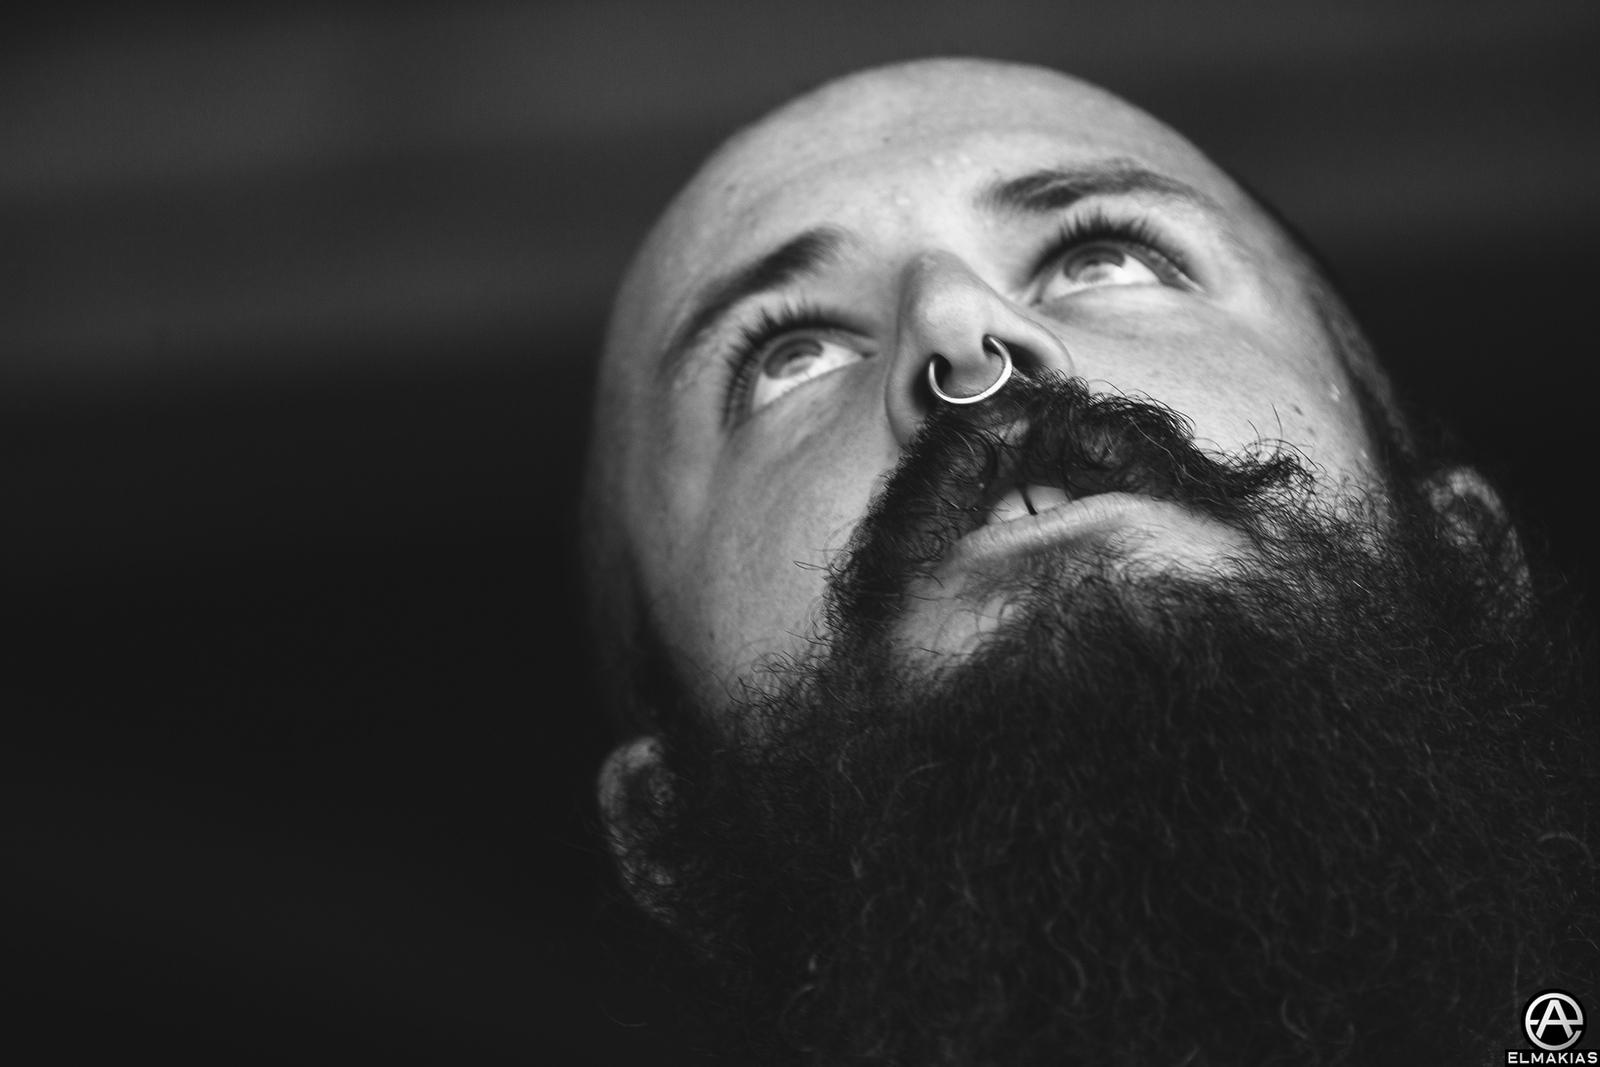 Onstage Portrait of Joel Quartuccio of Being As An Ocean live at Vans Warped Tour 2015 by Adam Elmakias